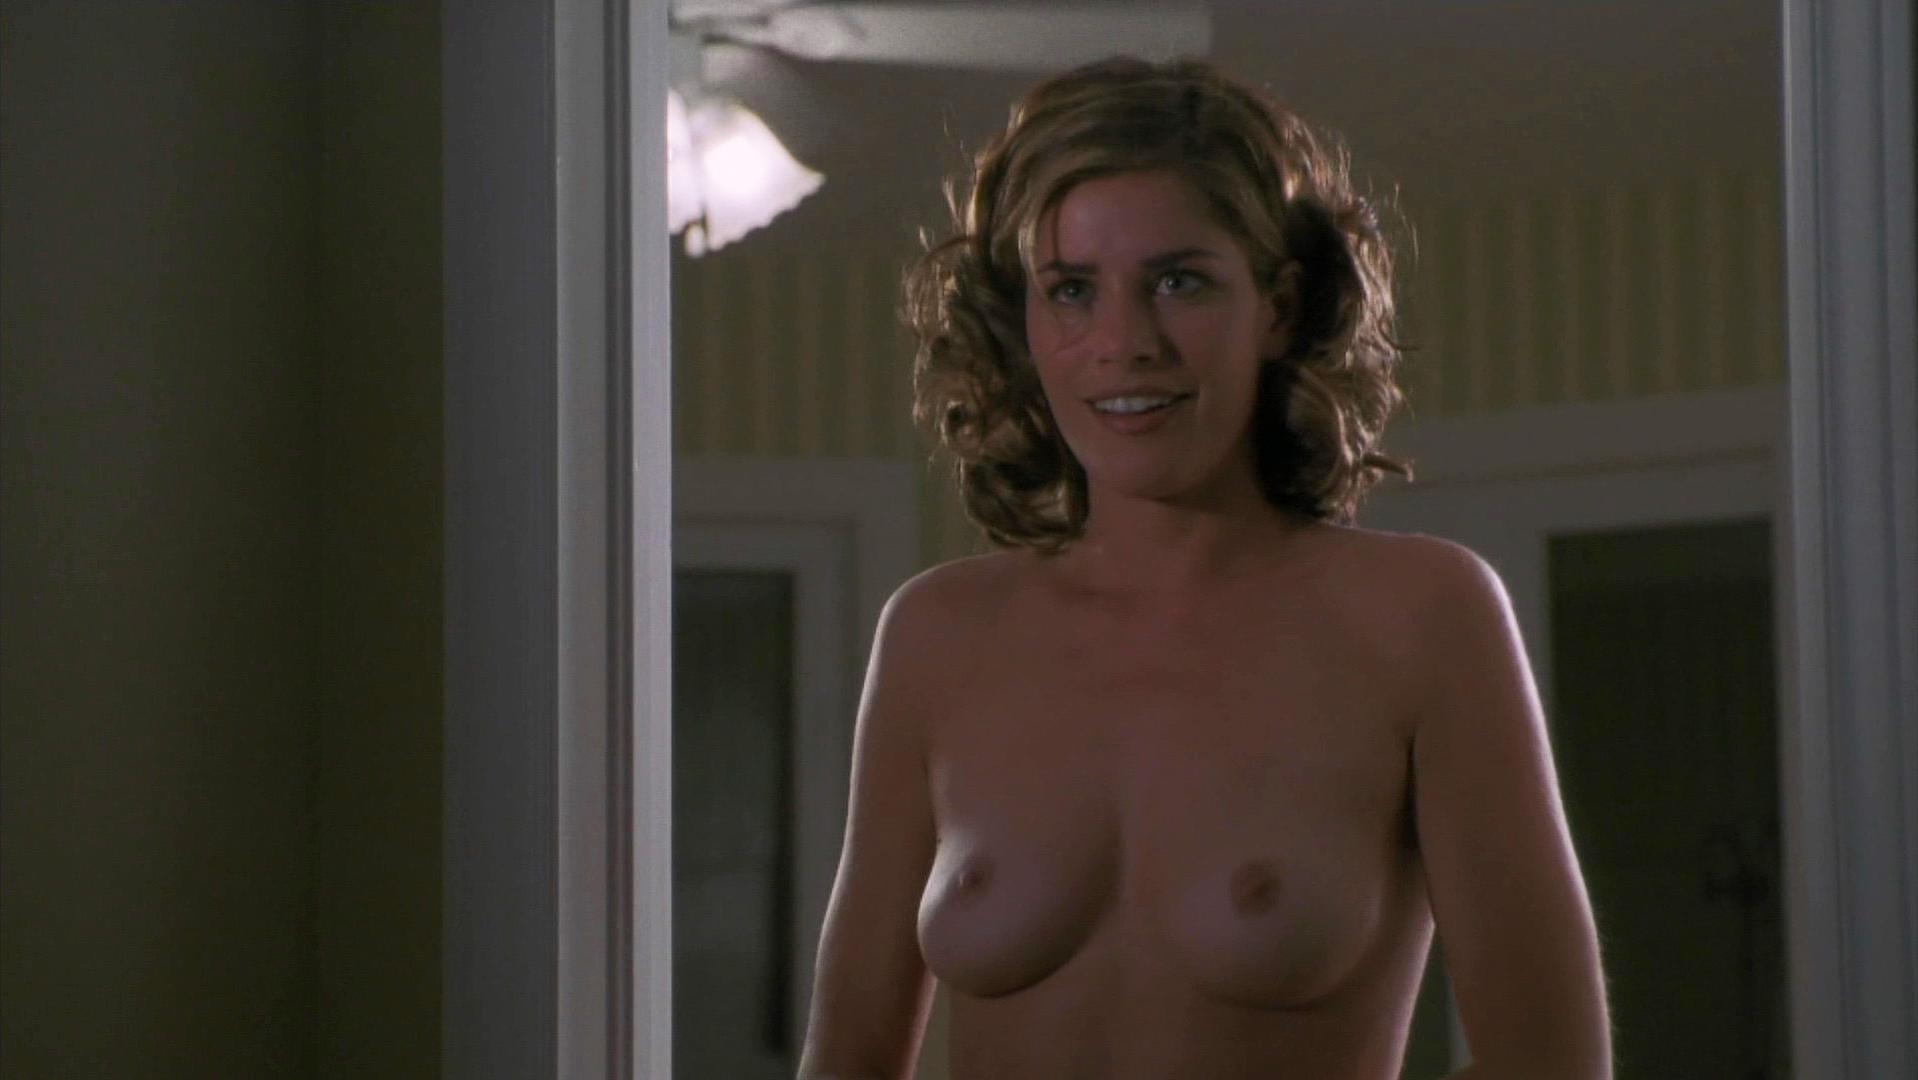 Amanda peet nude scene